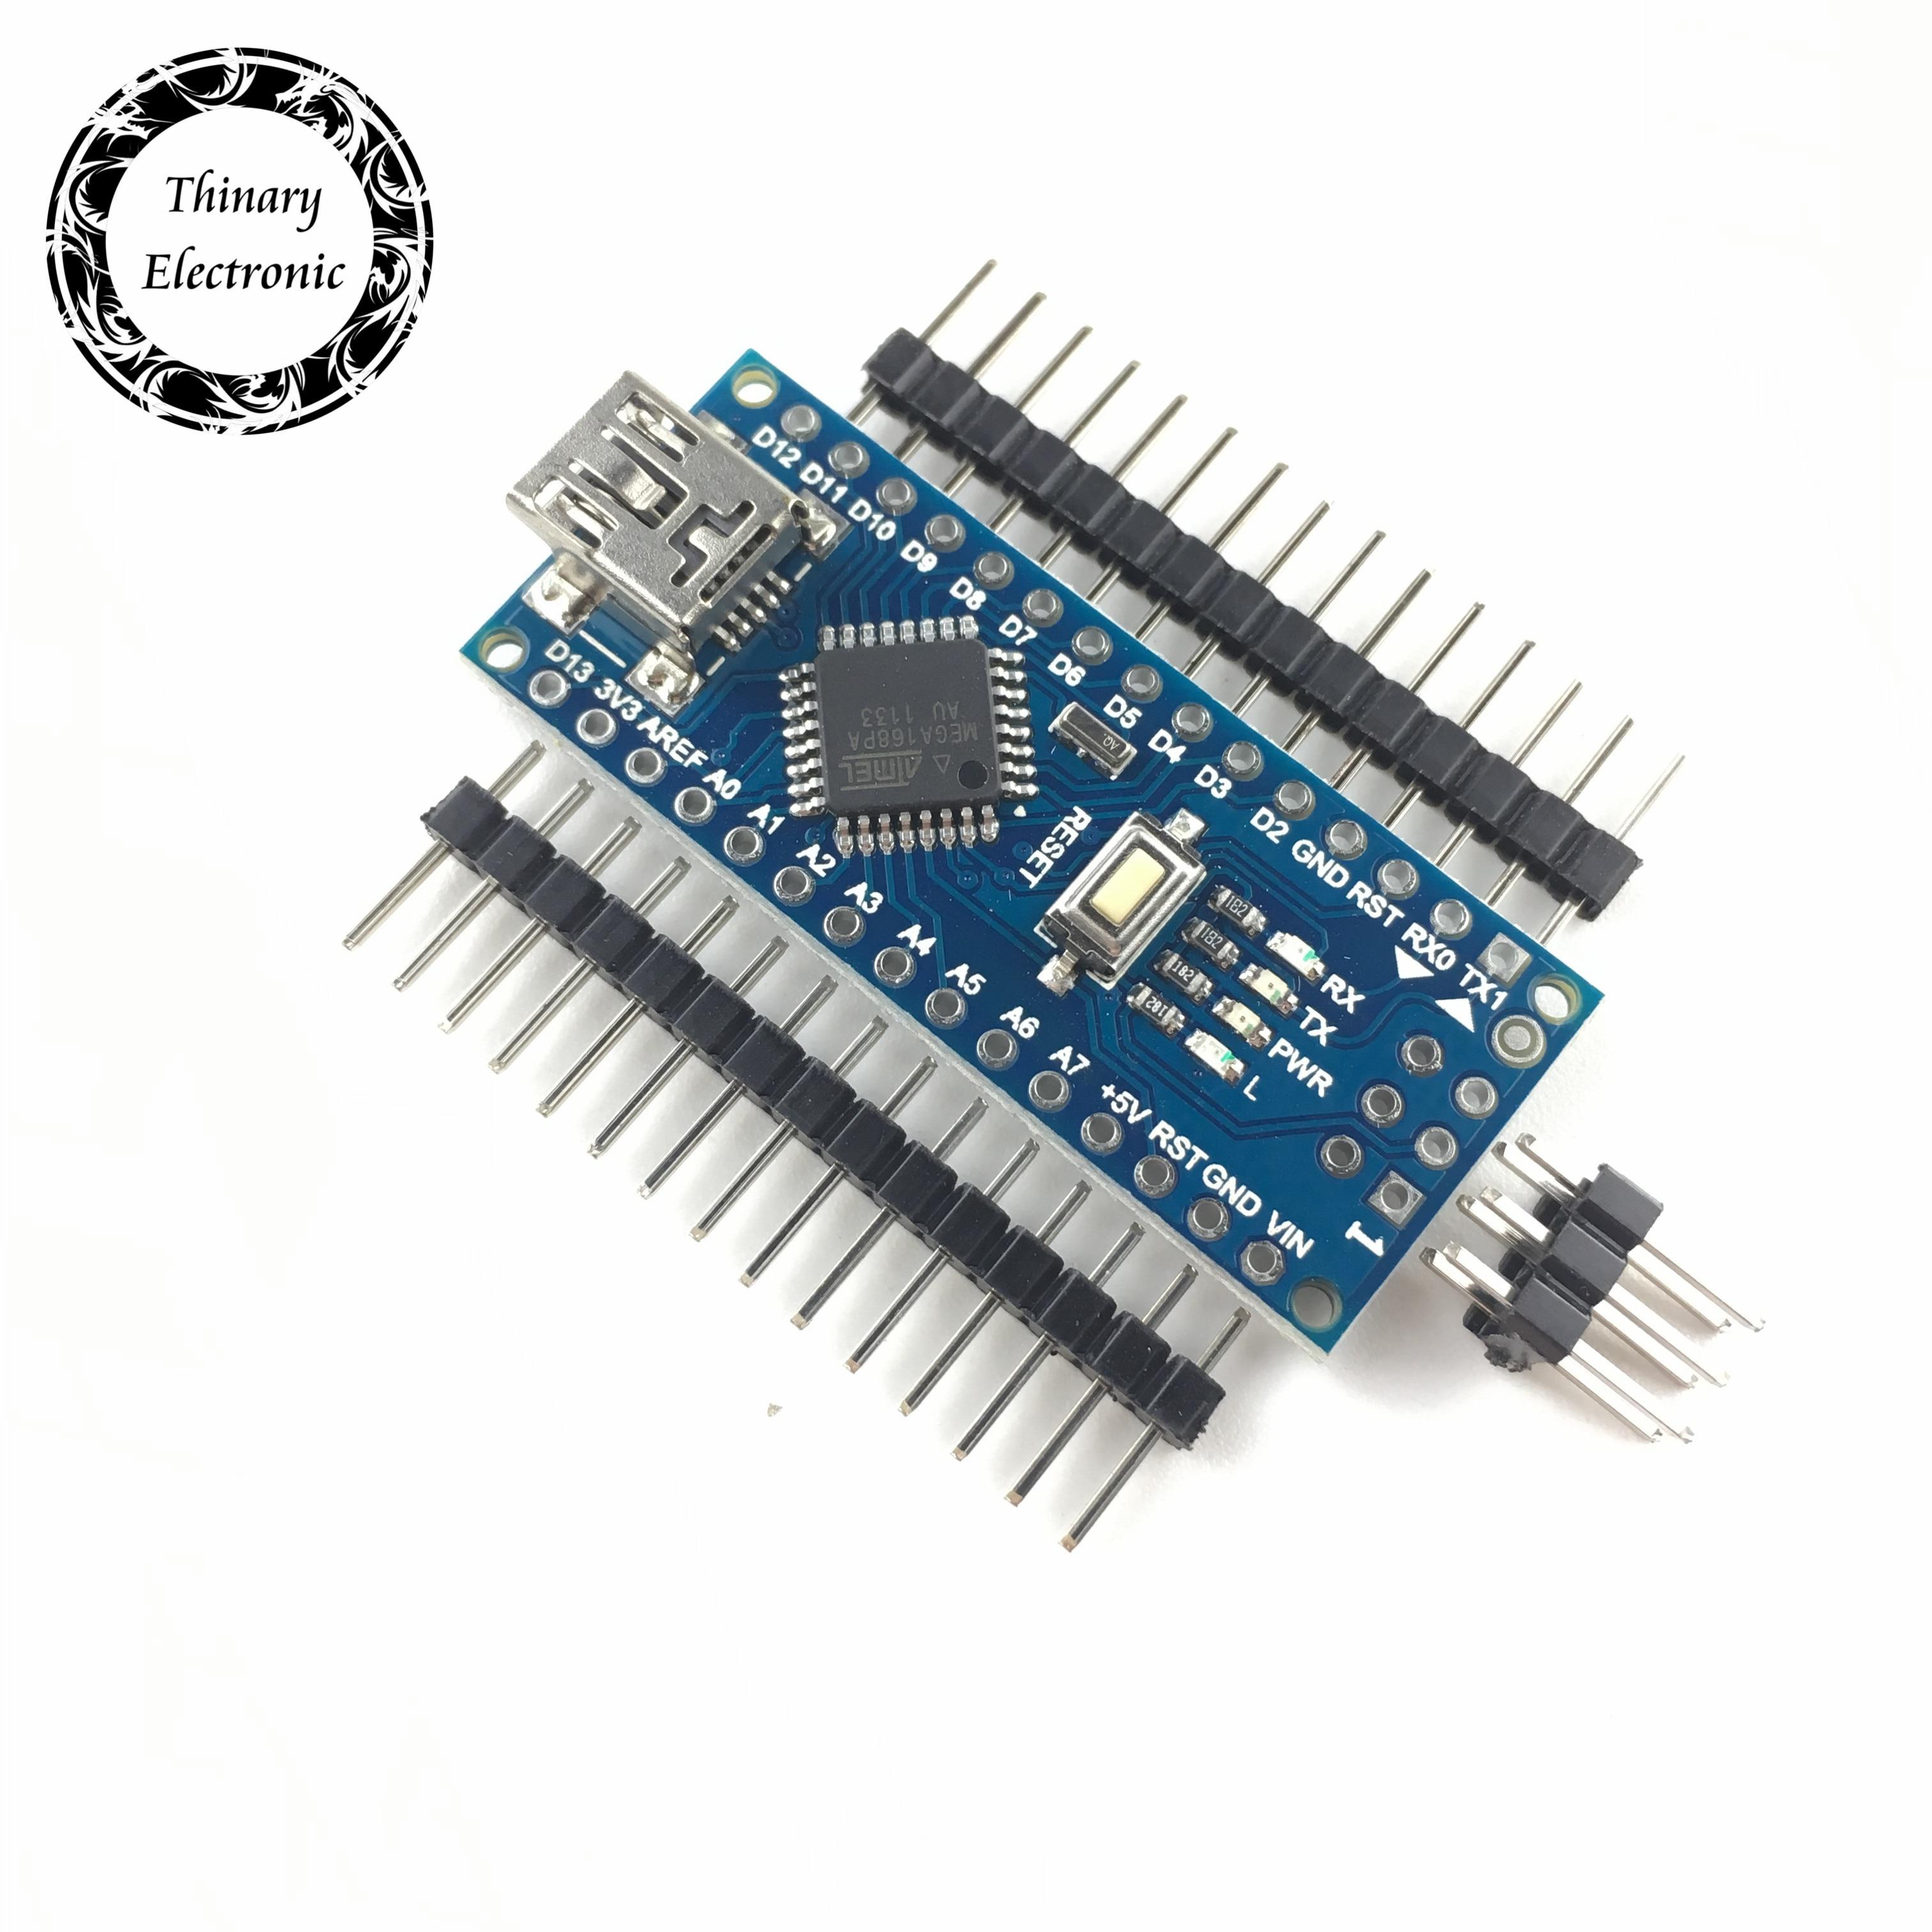 Thinary Nano Mini USB With the bootloader compatible Nano controller for arduino CH340 USB driver 16Mhz Nano ATMEGA168P|Integrated Circuits|   - AliExpress